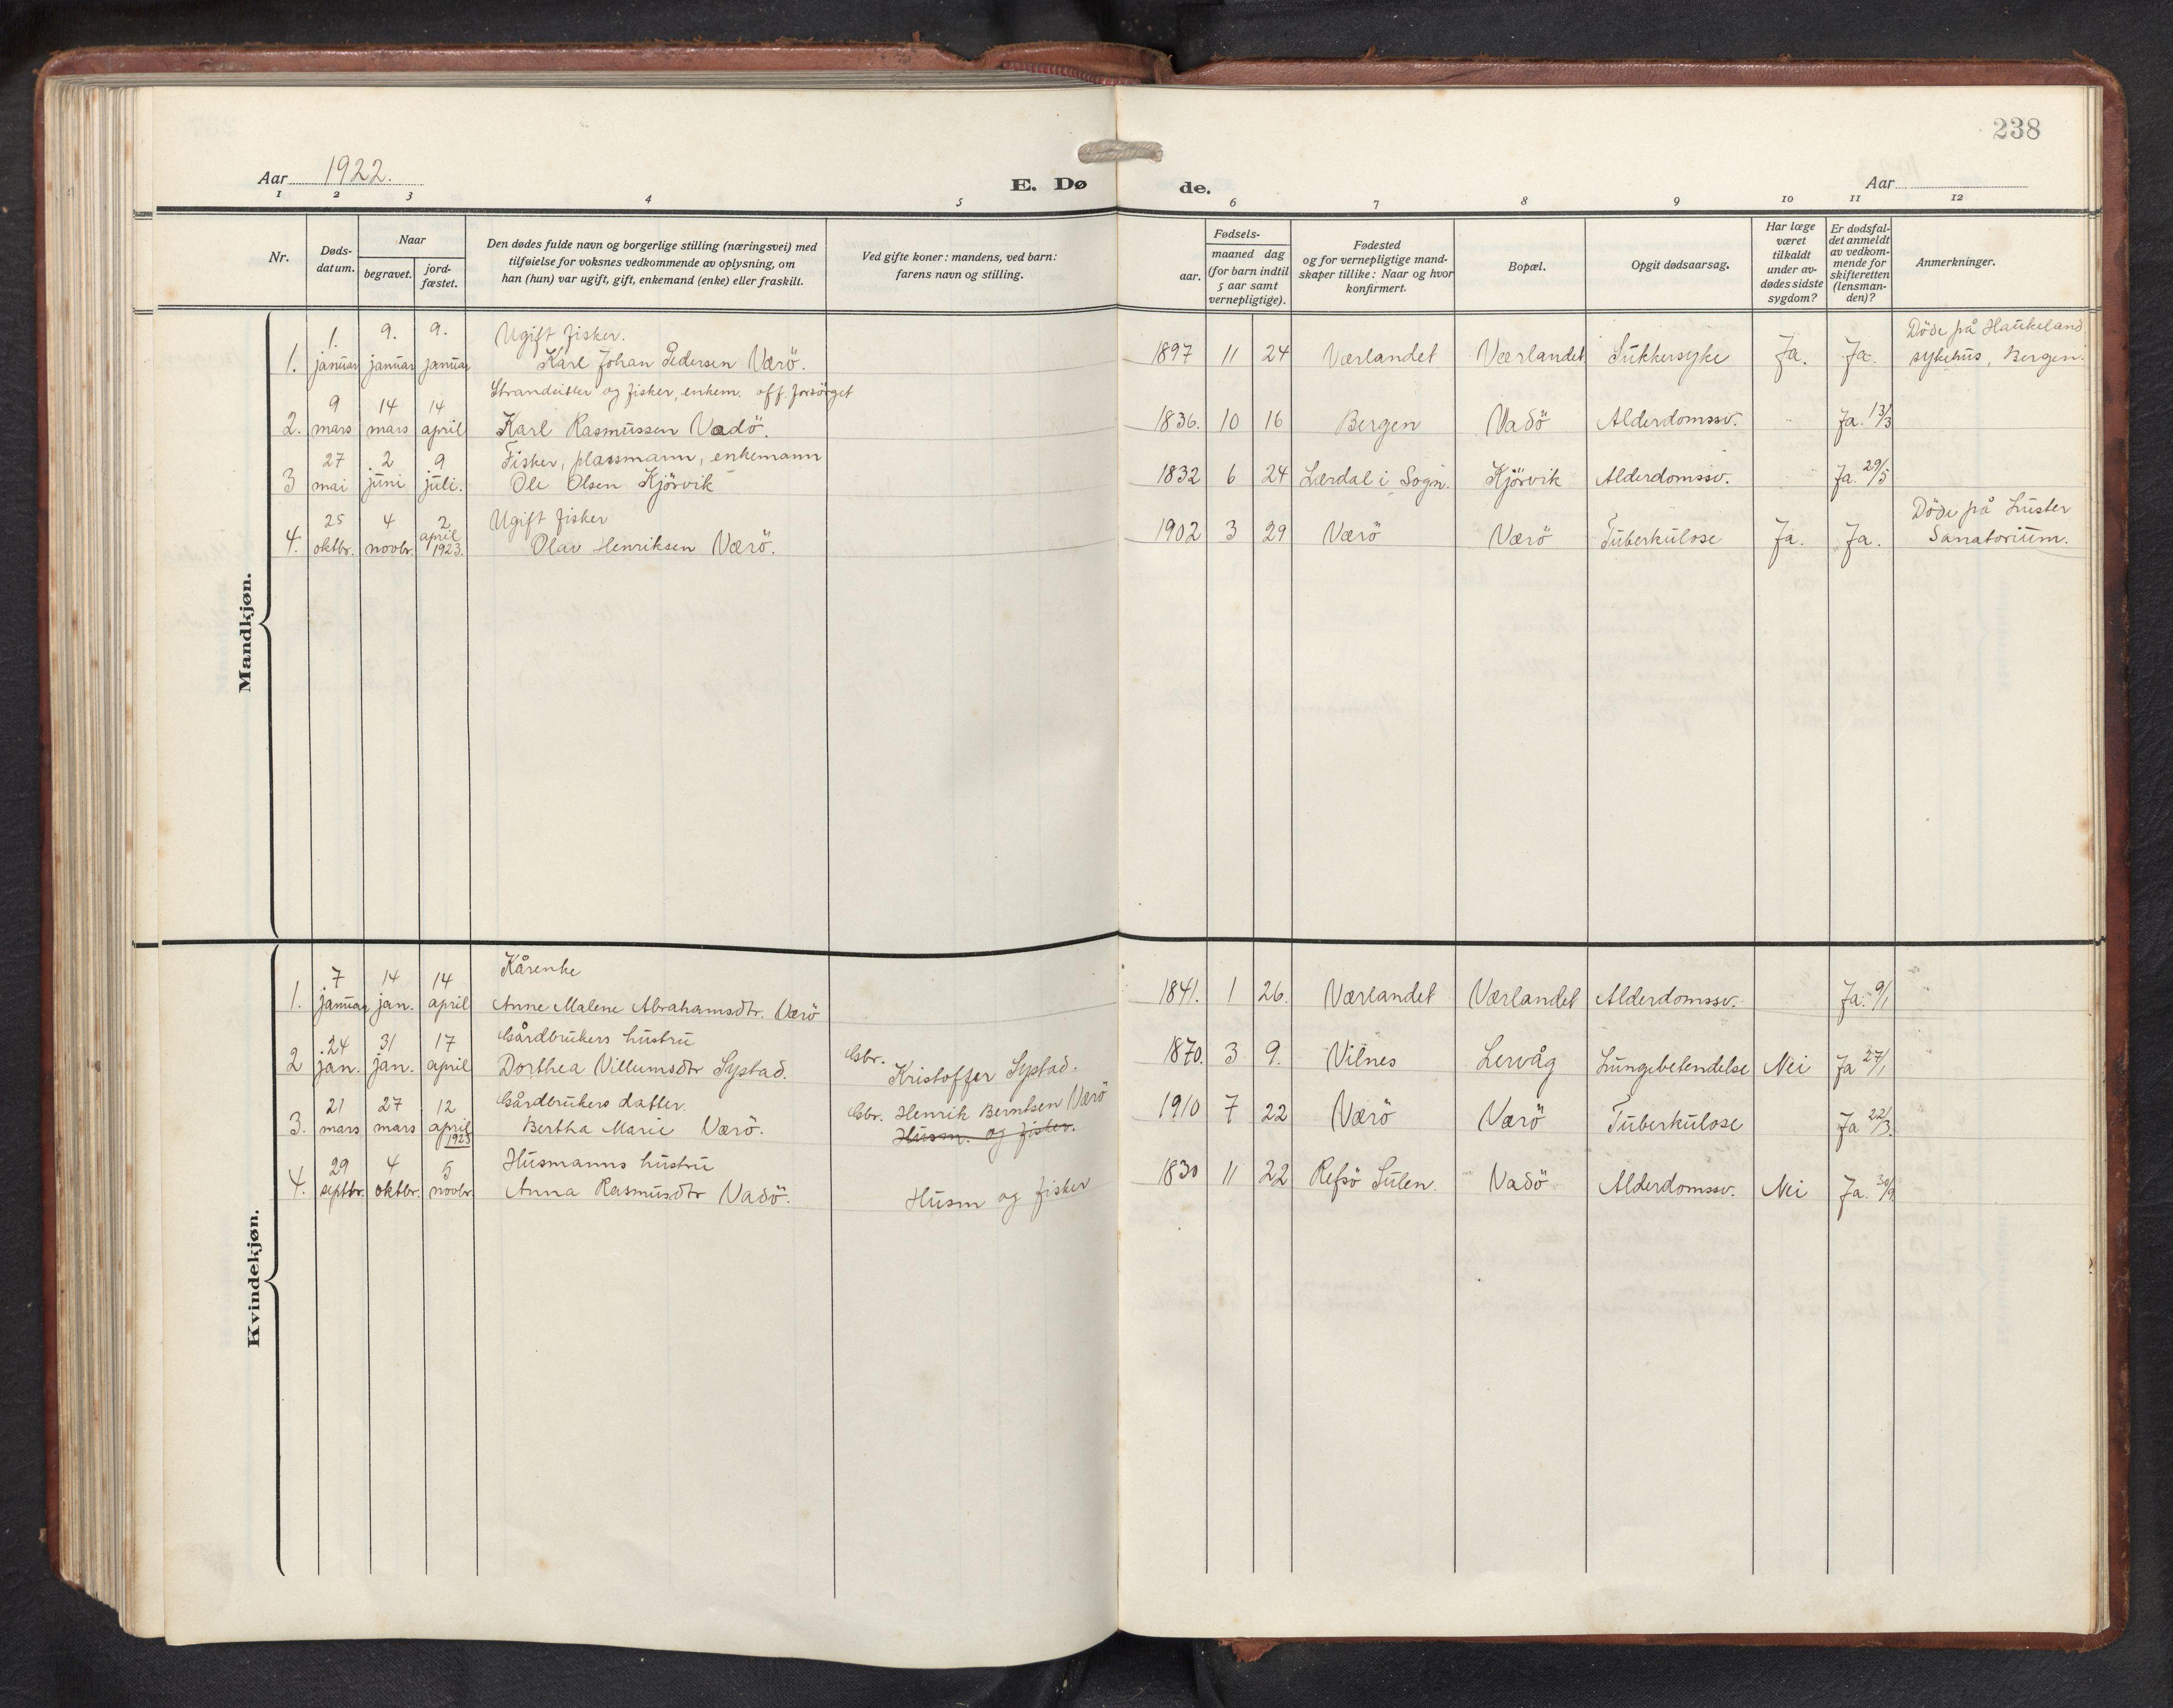 SAB, Askvoll sokneprestembete, H/Hab/Habb/L0002: Klokkerbok nr. B 2, 1910-1947, s. 237b-238a